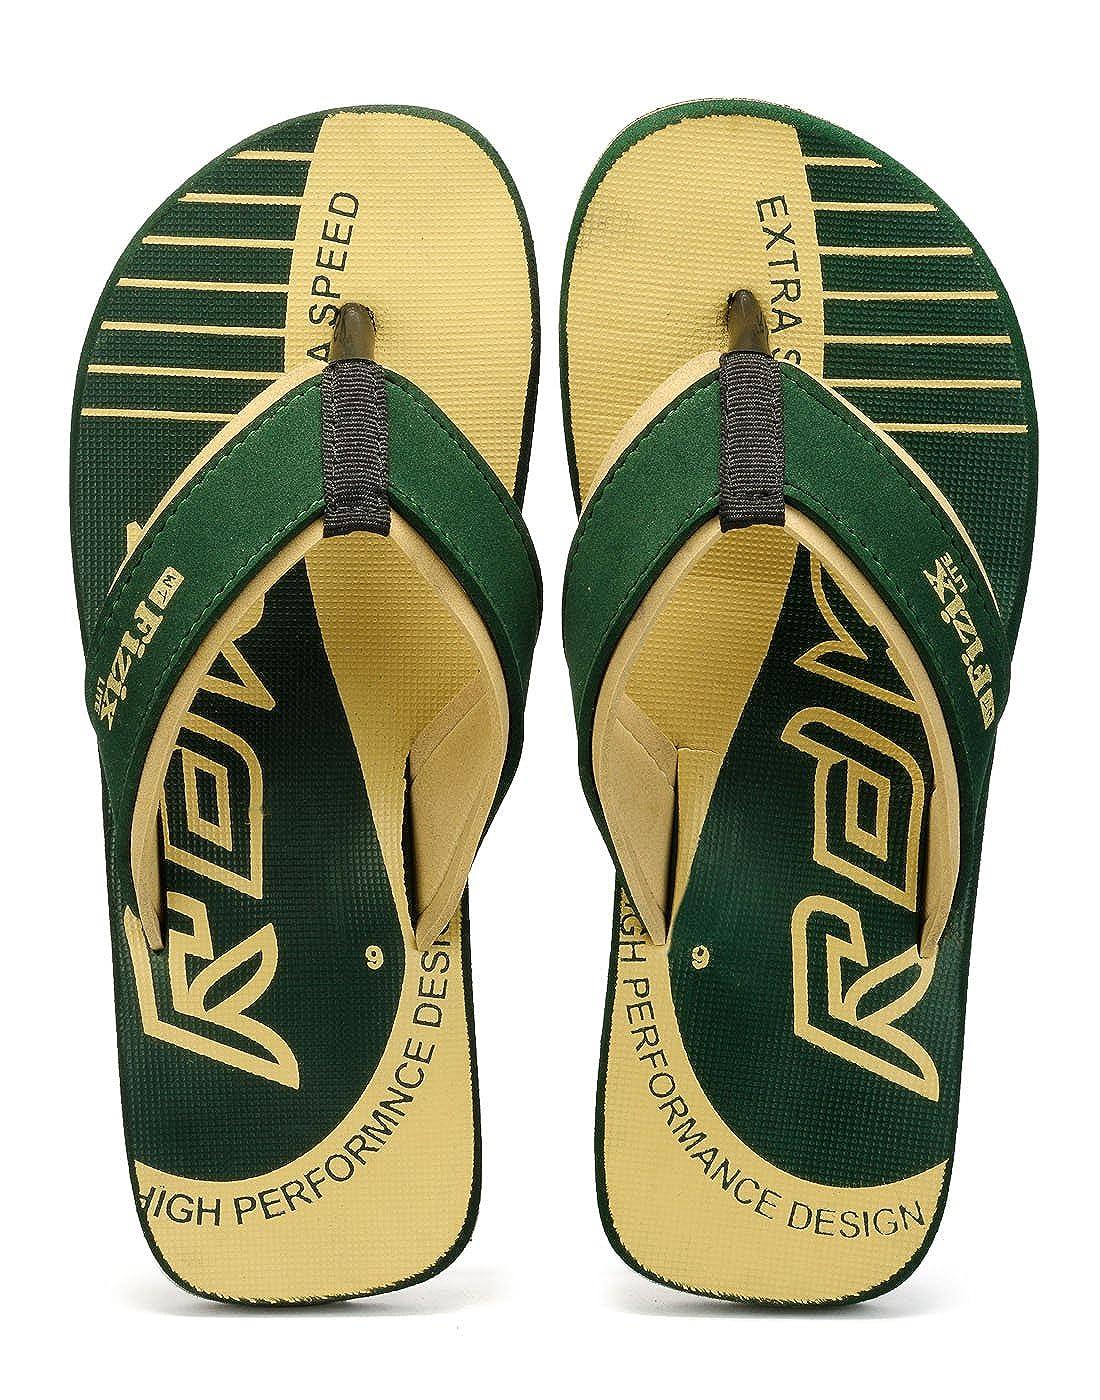 038e960cdd5d4 Frestol Men s Green Soft Eva Flip-Flops -7  Buy Online at Low Prices in  India - Amazon.in